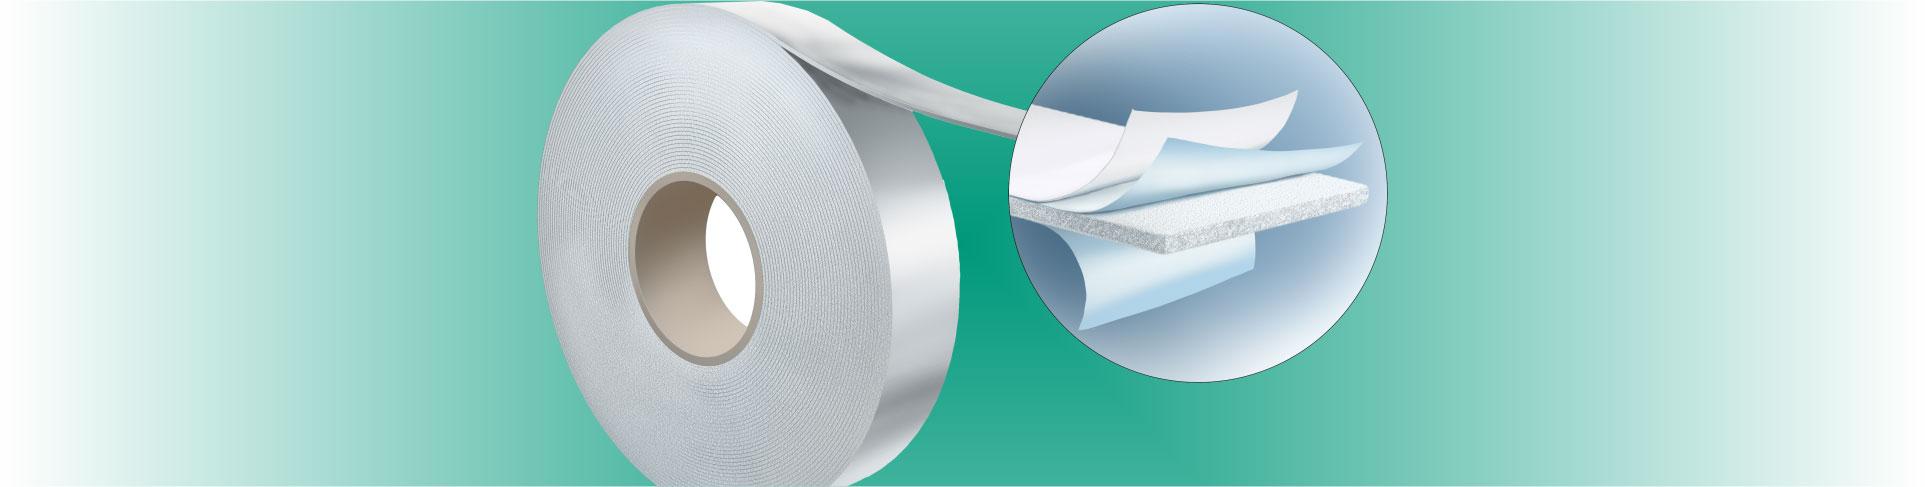 Trocellen Adhesive_tapes_BU_